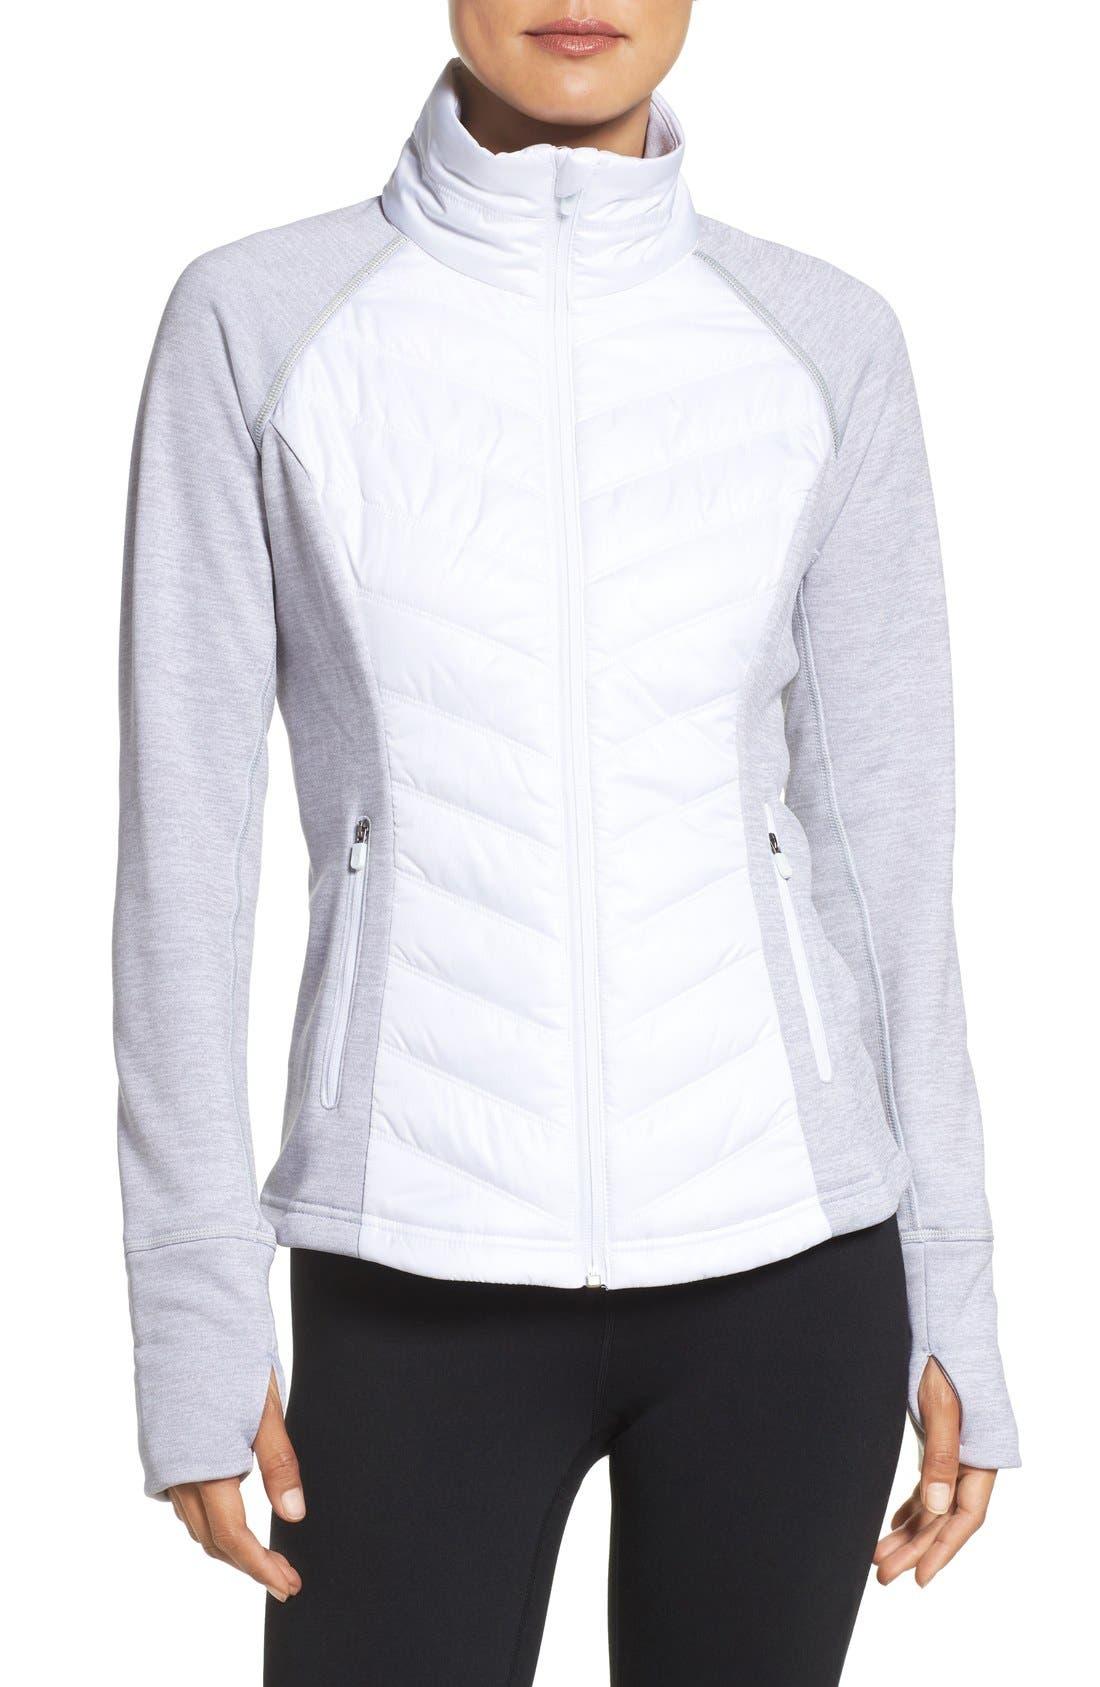 Zella Zelfusion Reflective Quilted Jacket